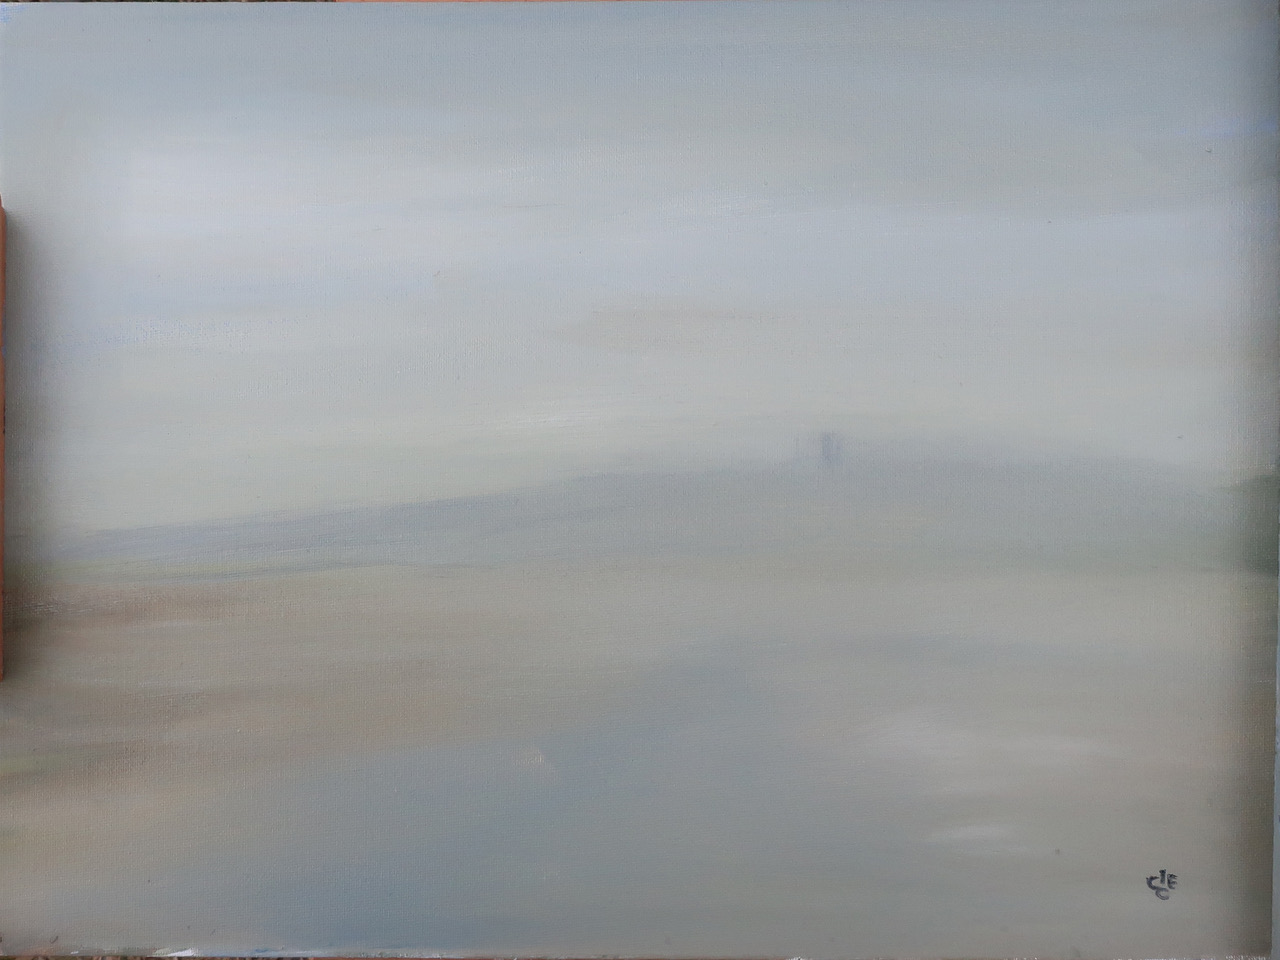 Morston creek in a fog